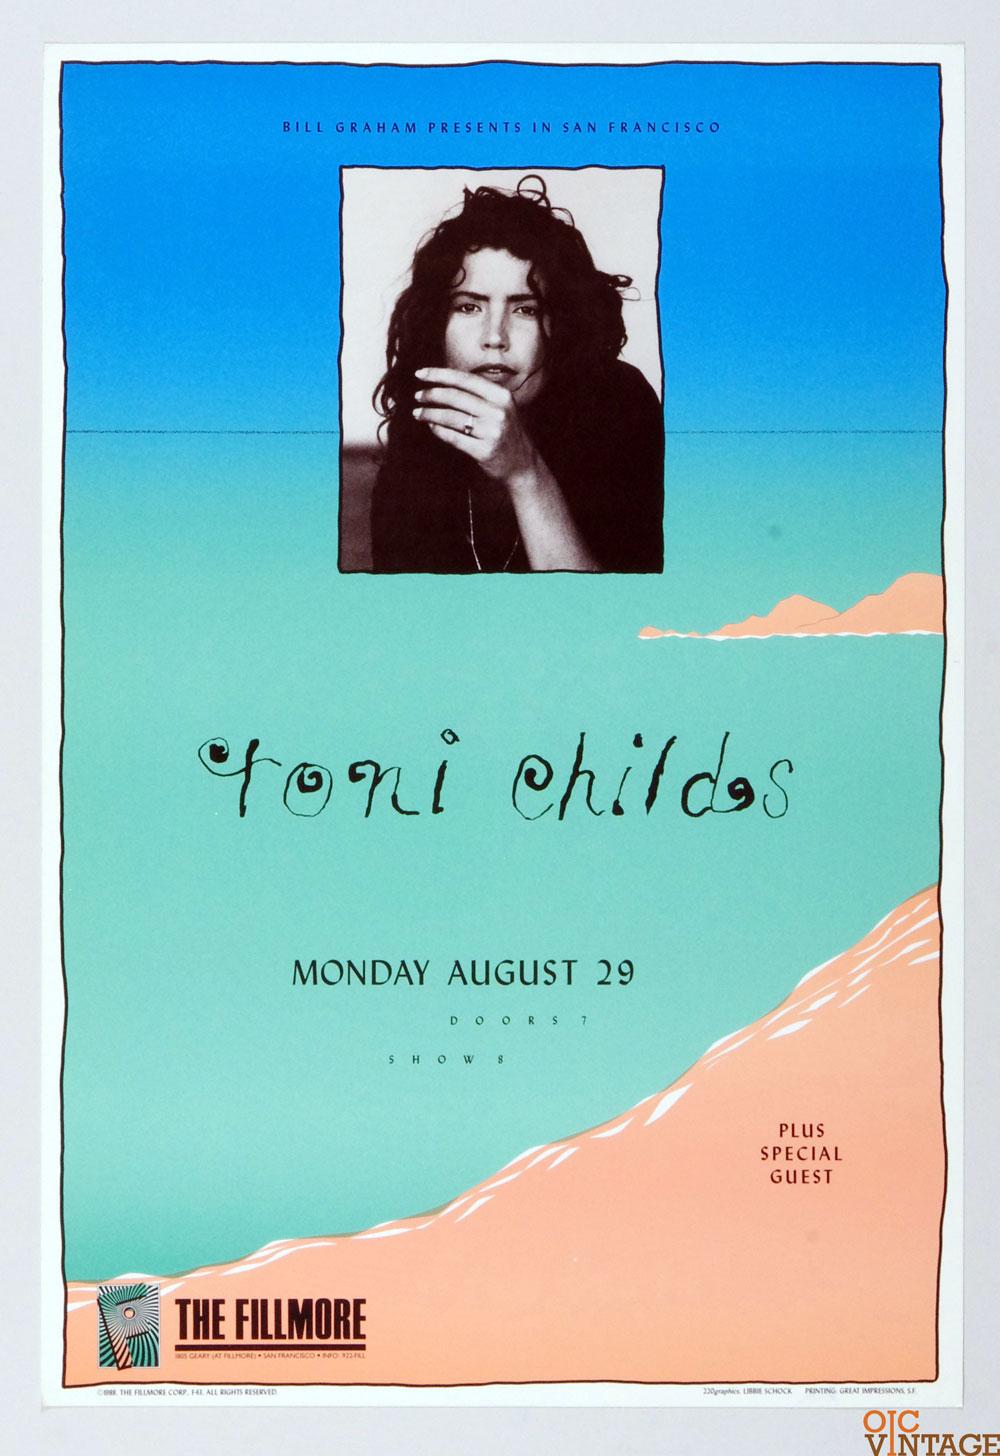 Toni Childs Poster 1988 Aug 29 New Fillmore